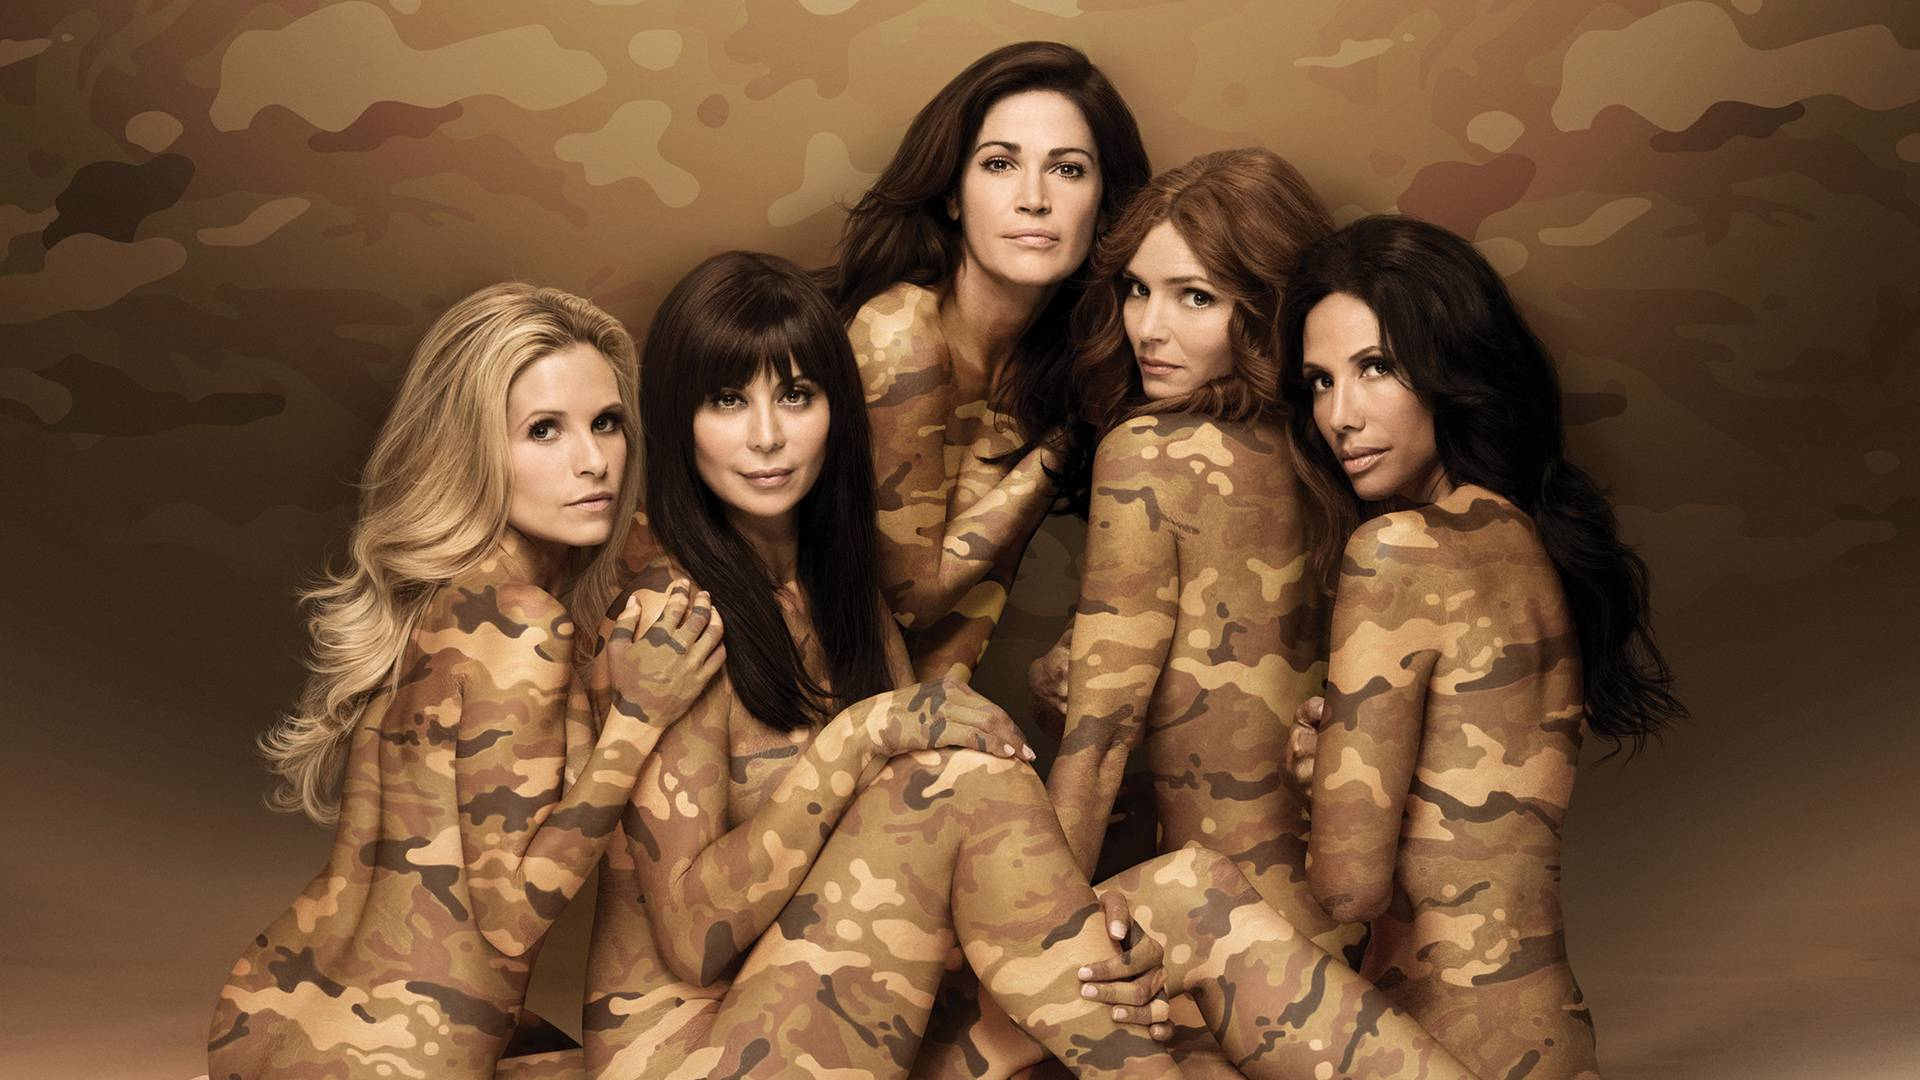 Army Wife Wallpaper - WallpaperSafari  |Army Wife Desktop Background